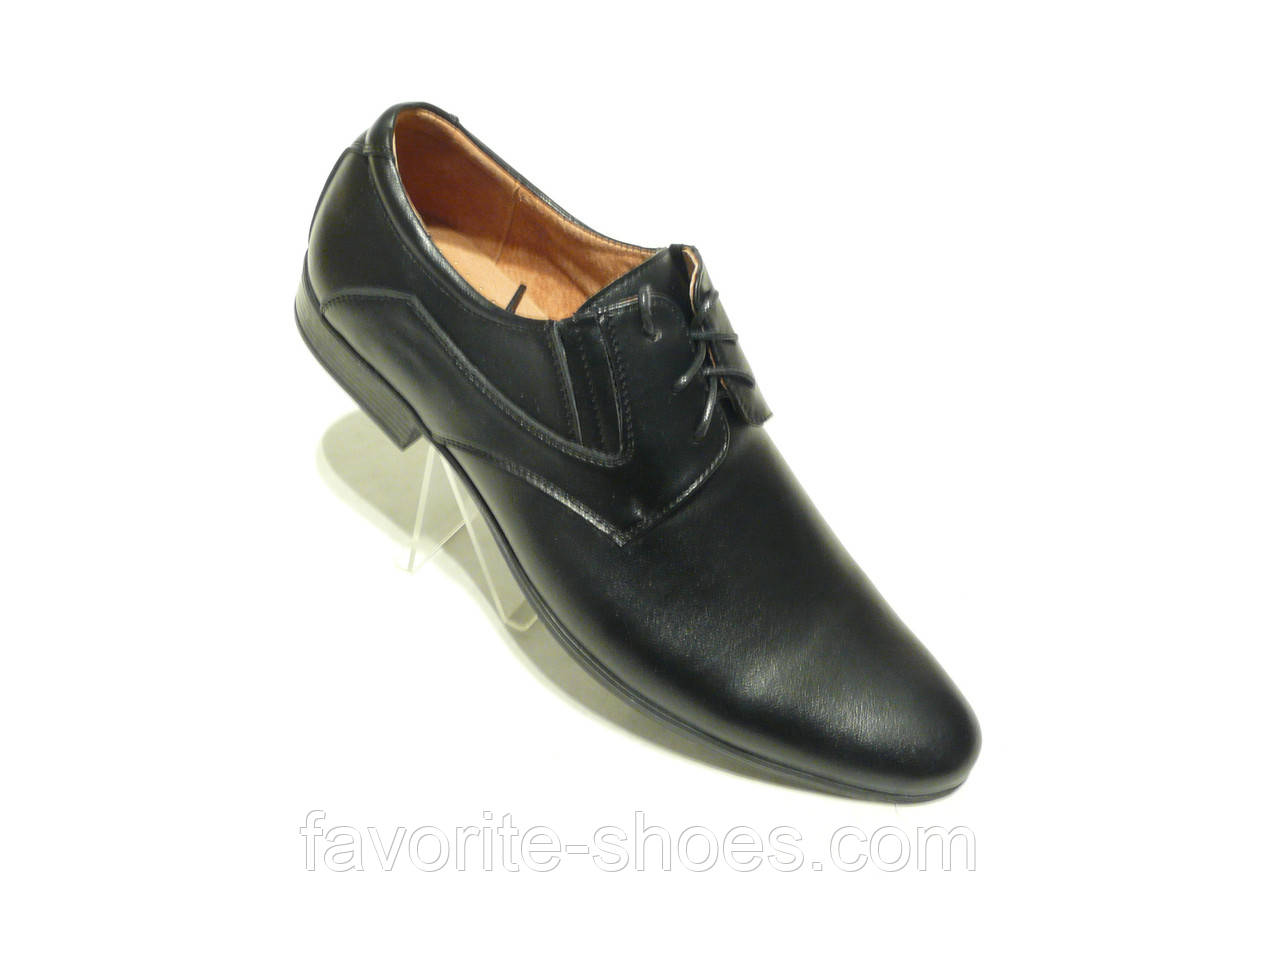 Кожаные мужские туфли Silver резинка шнурок